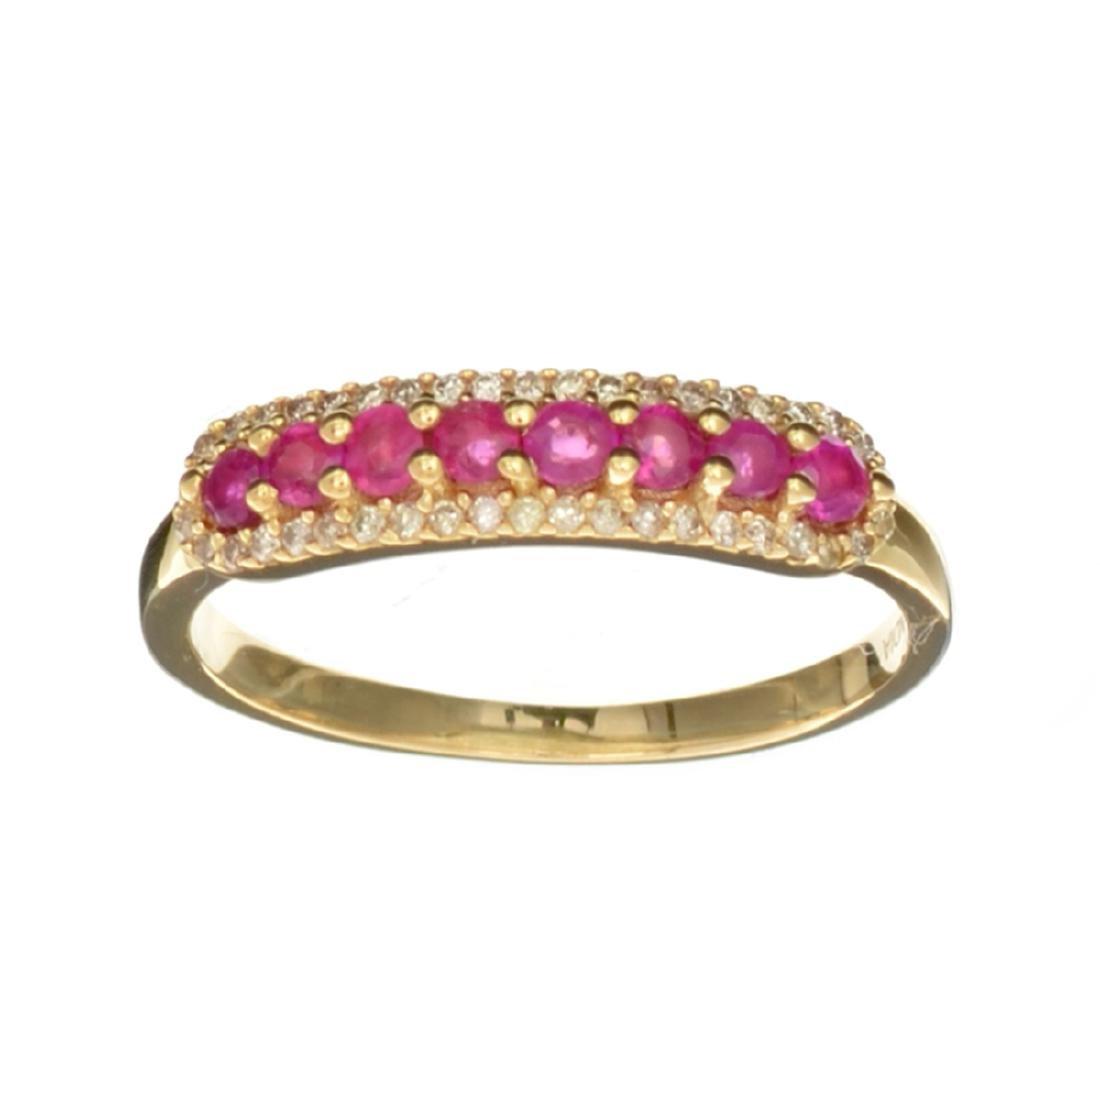 Designer Sebastian 14 KT Gold, Round Cut Ruby and